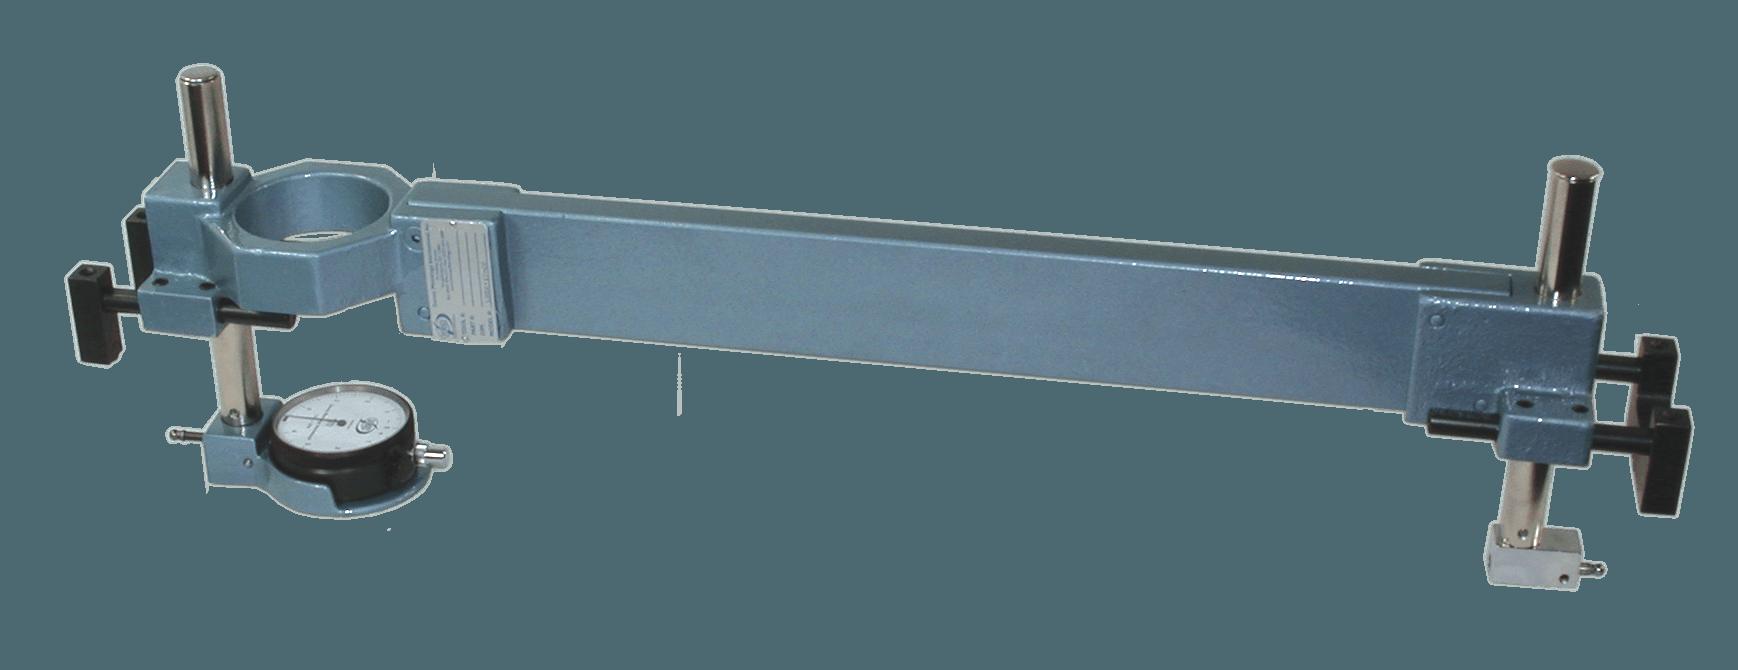 LDDF Large Diameter Gage